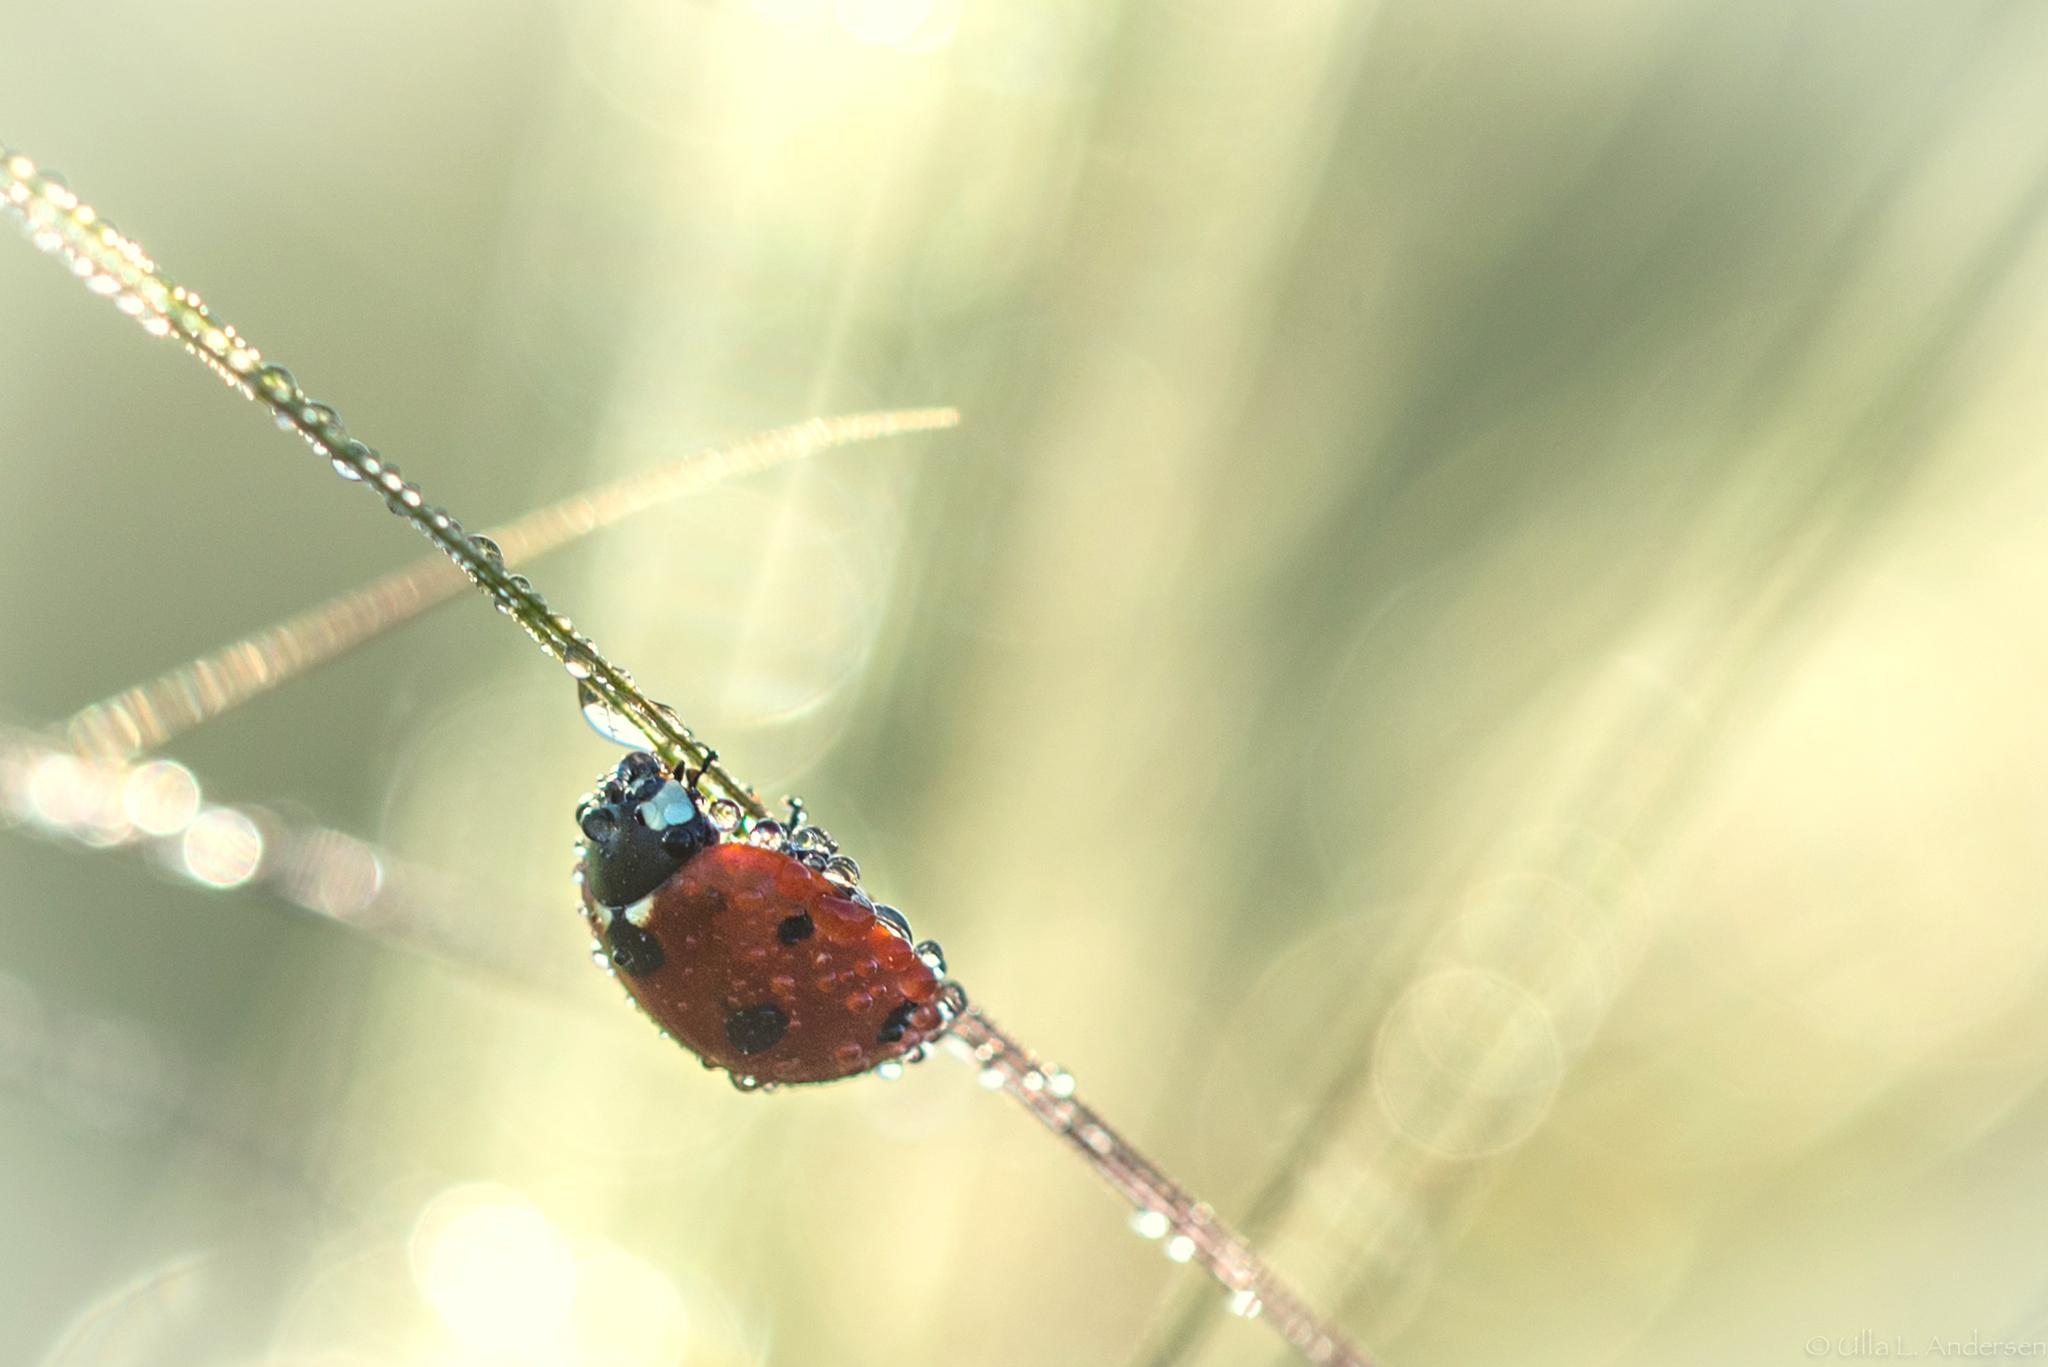 Ladybug after shower by Ulla Lippert Andersen